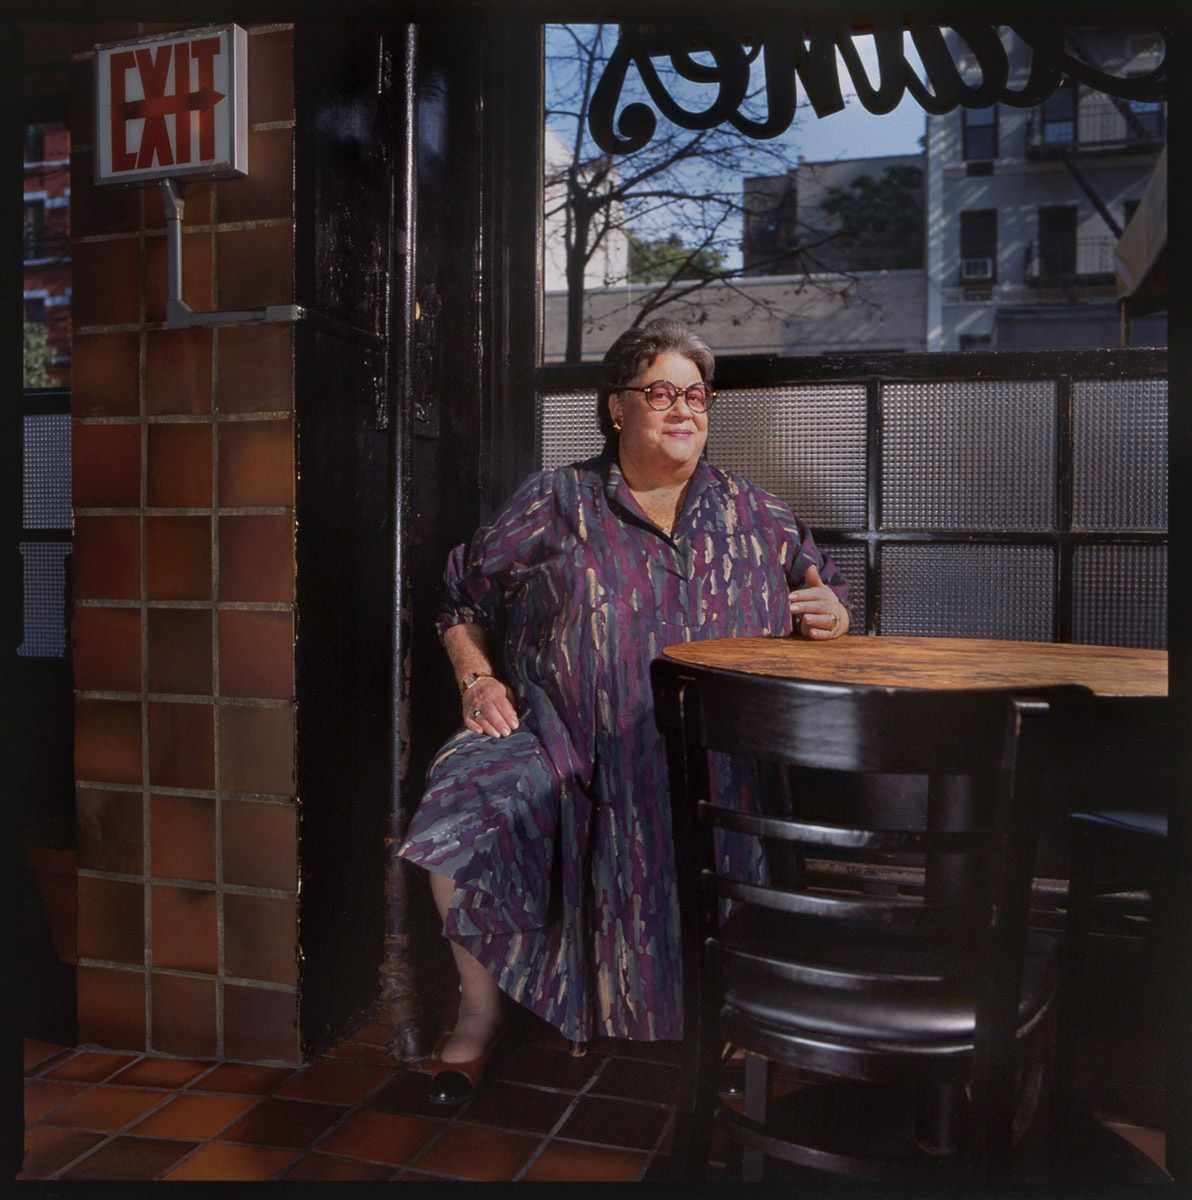 ELAINE KAUFMAN, OWNER, ELAINE'S RESTAURANT,  LITERARY HOT-SPOT